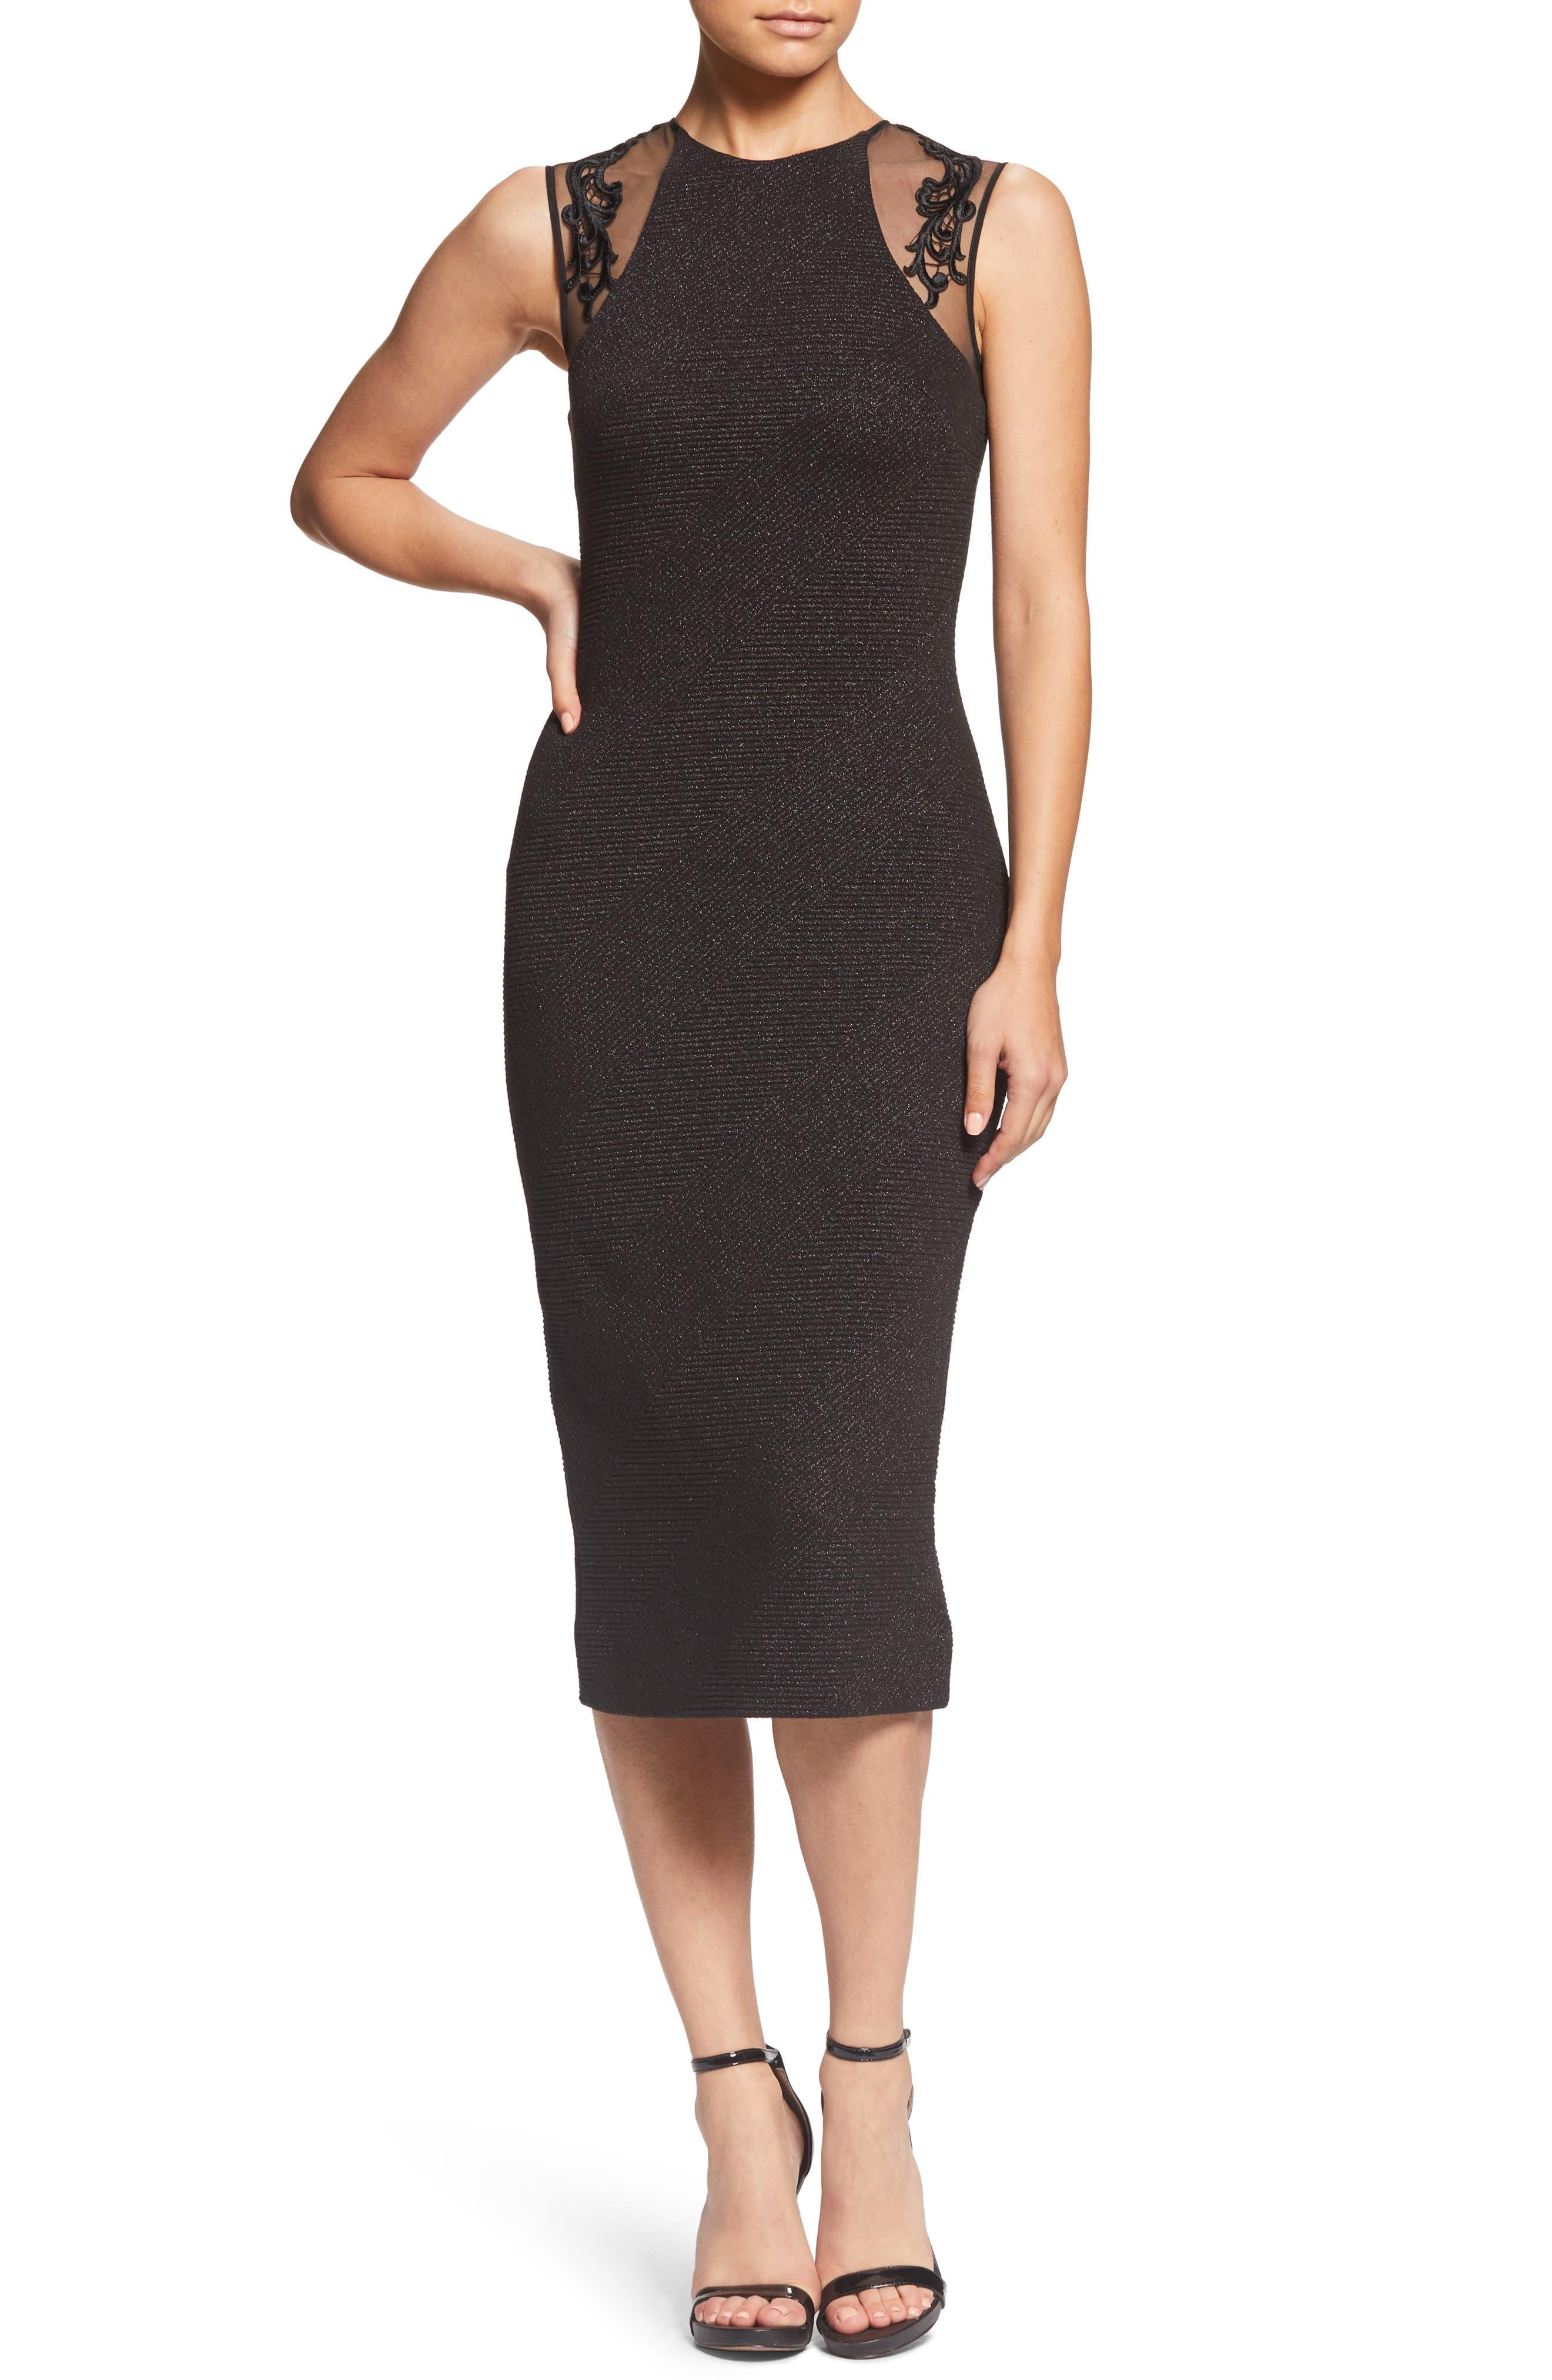 Skylar Embellished Sheath Dress,                             Main thumbnail 1, color,                             BLACK